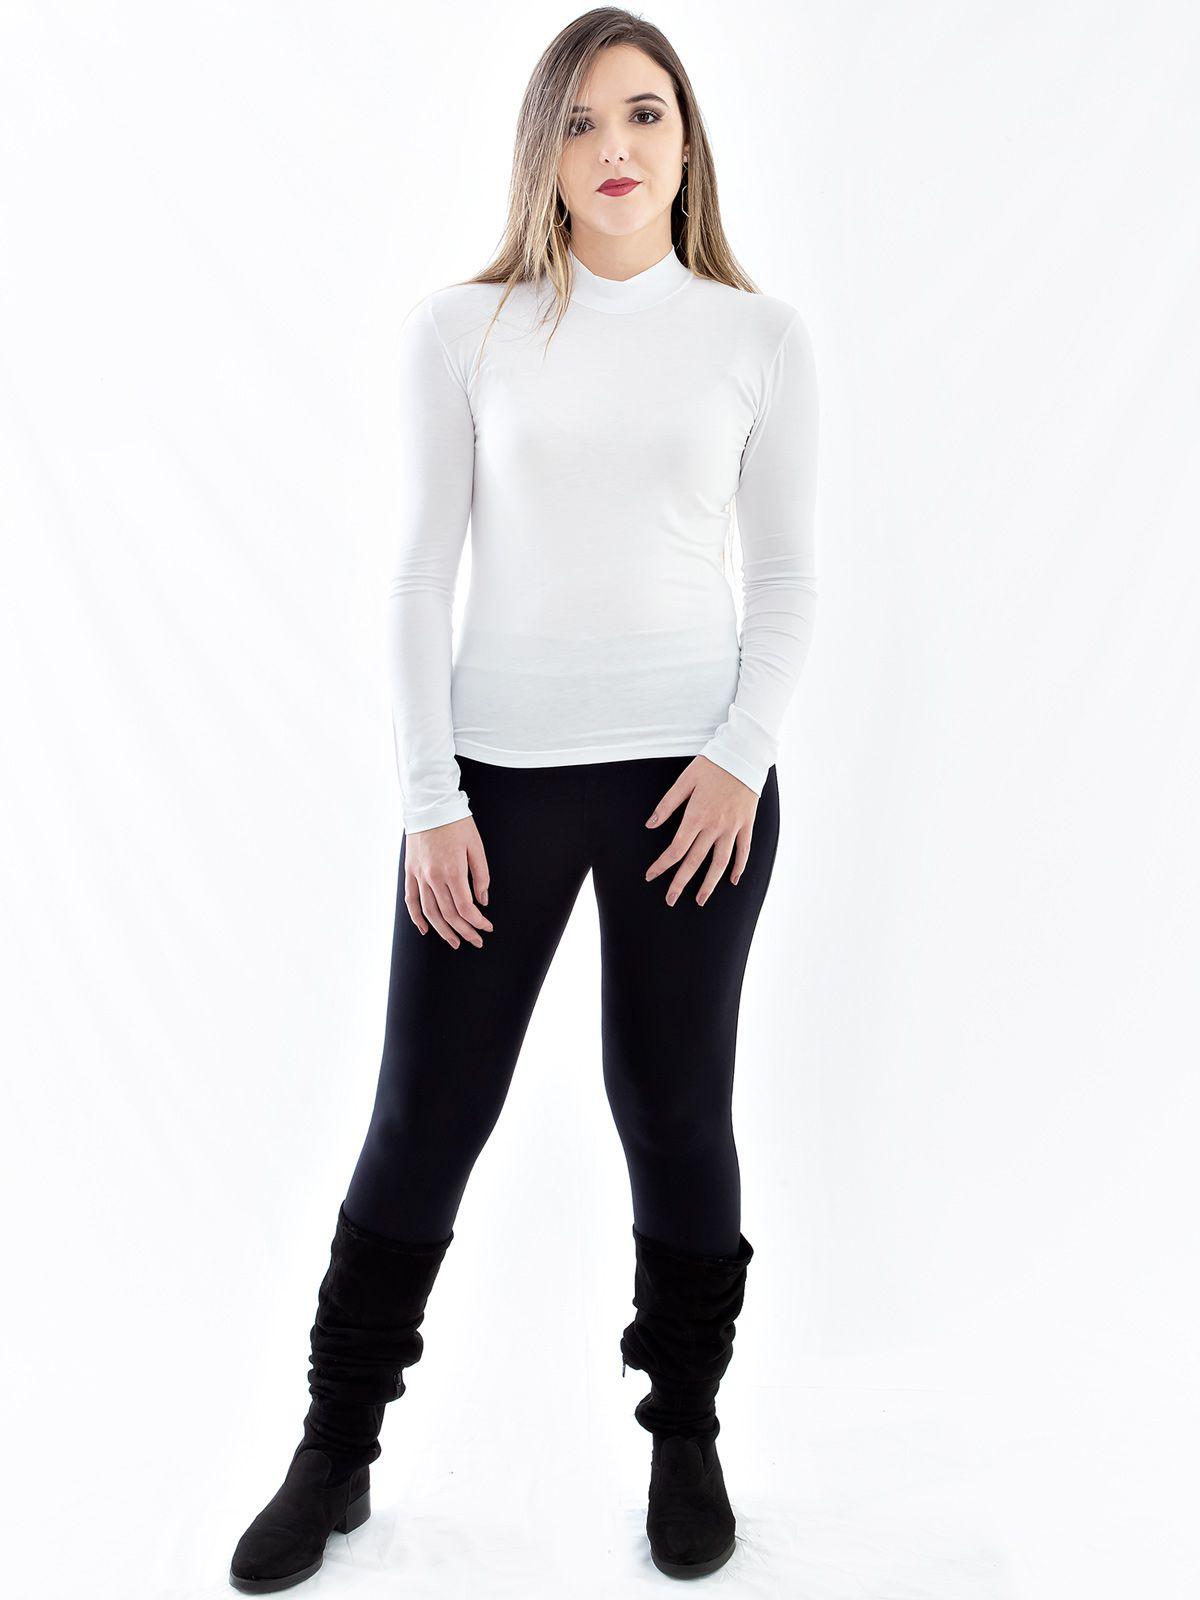 Blusa Feminina de Viscolycra Gola Alta Anistia Branca